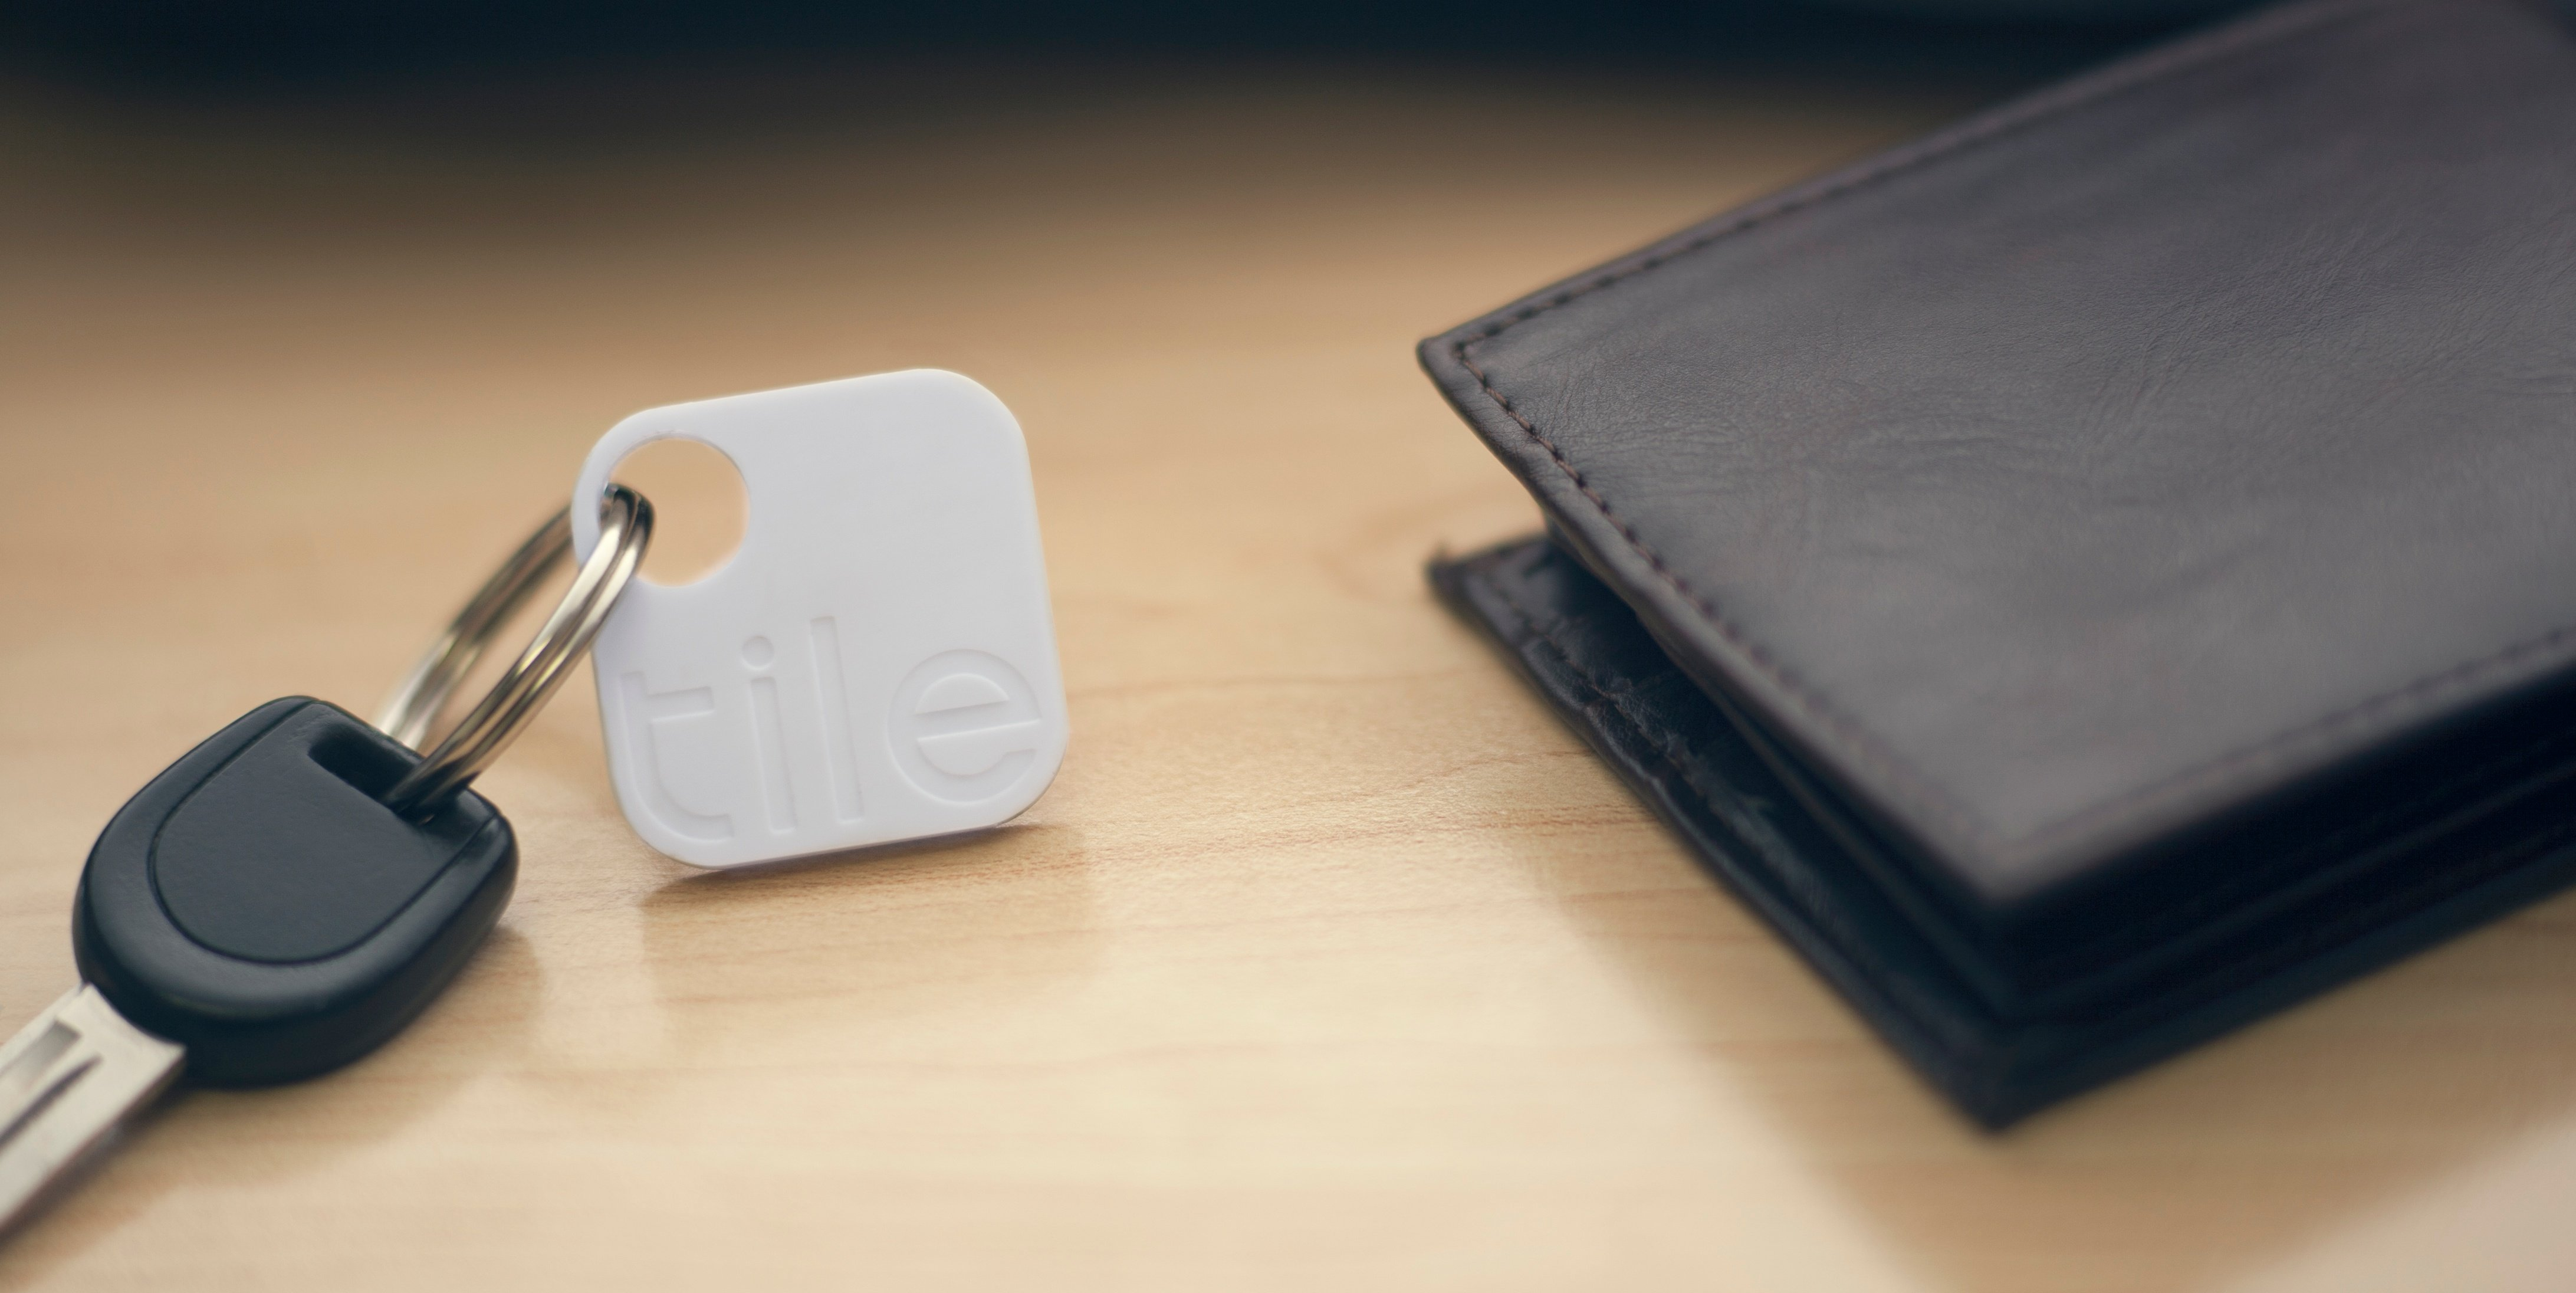 Tile-Lifestyle-Keys.jpg